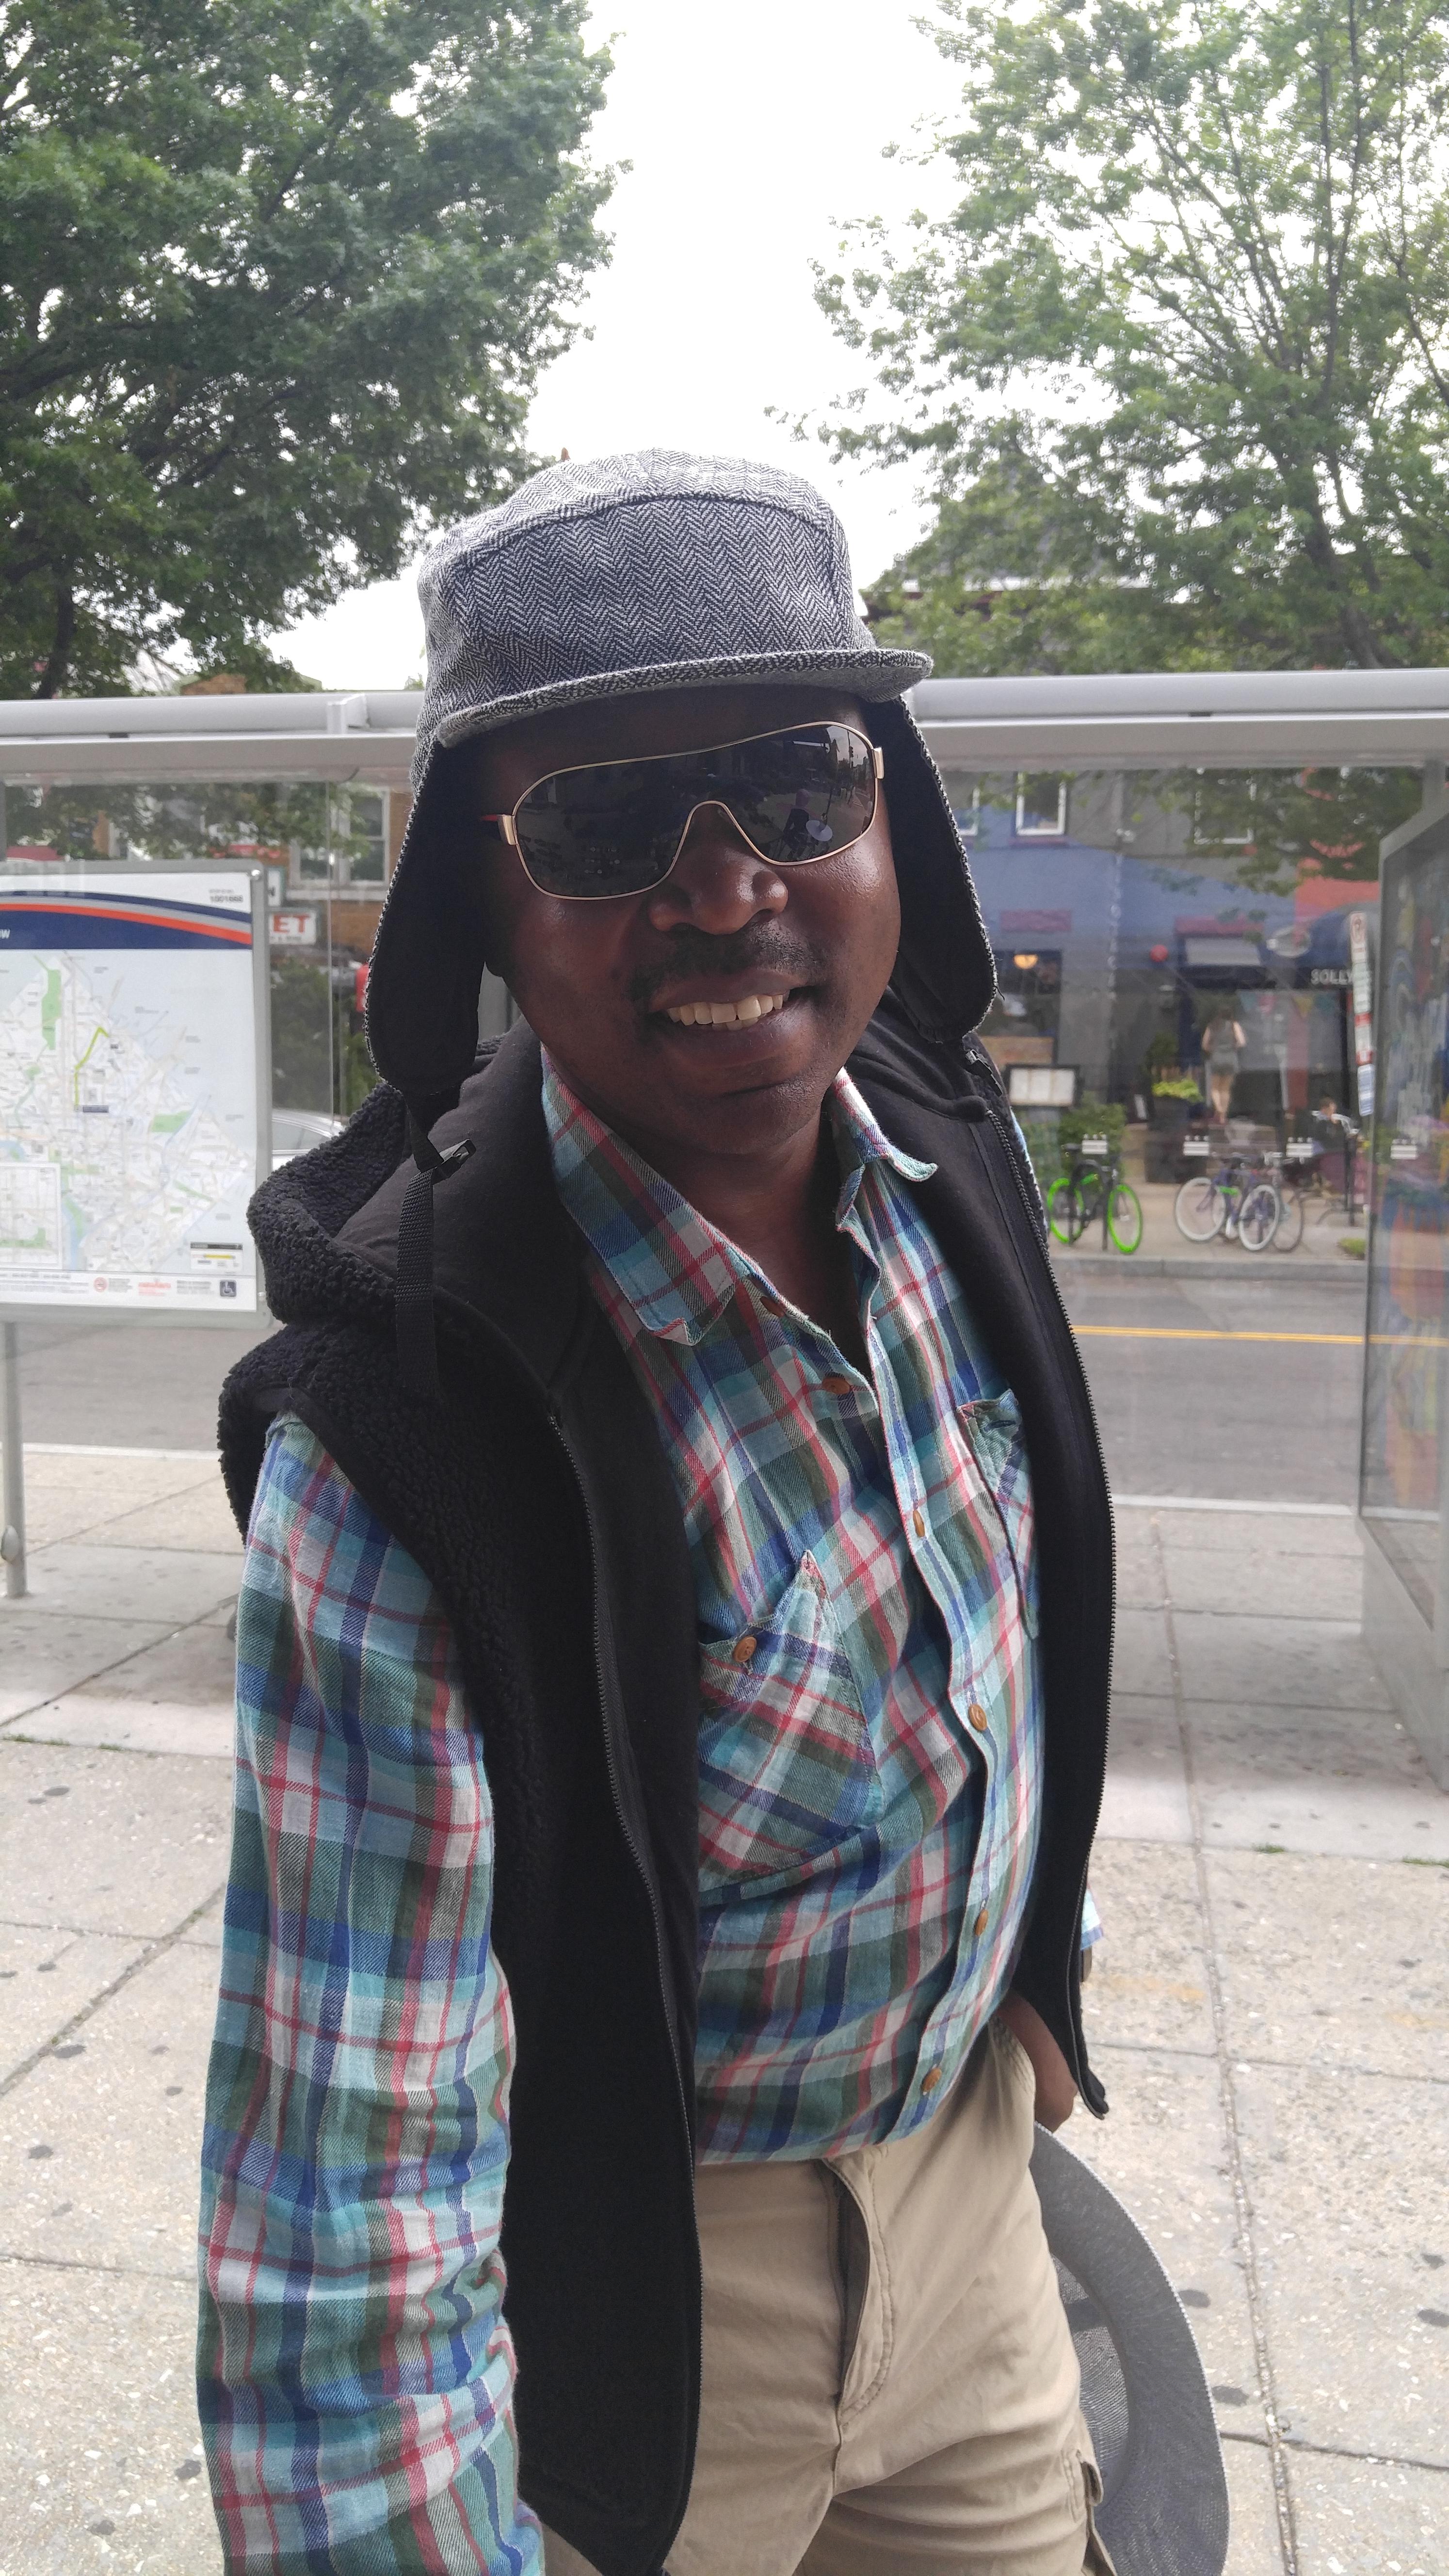 Customer in earflap tweed cap & sport sunglasses